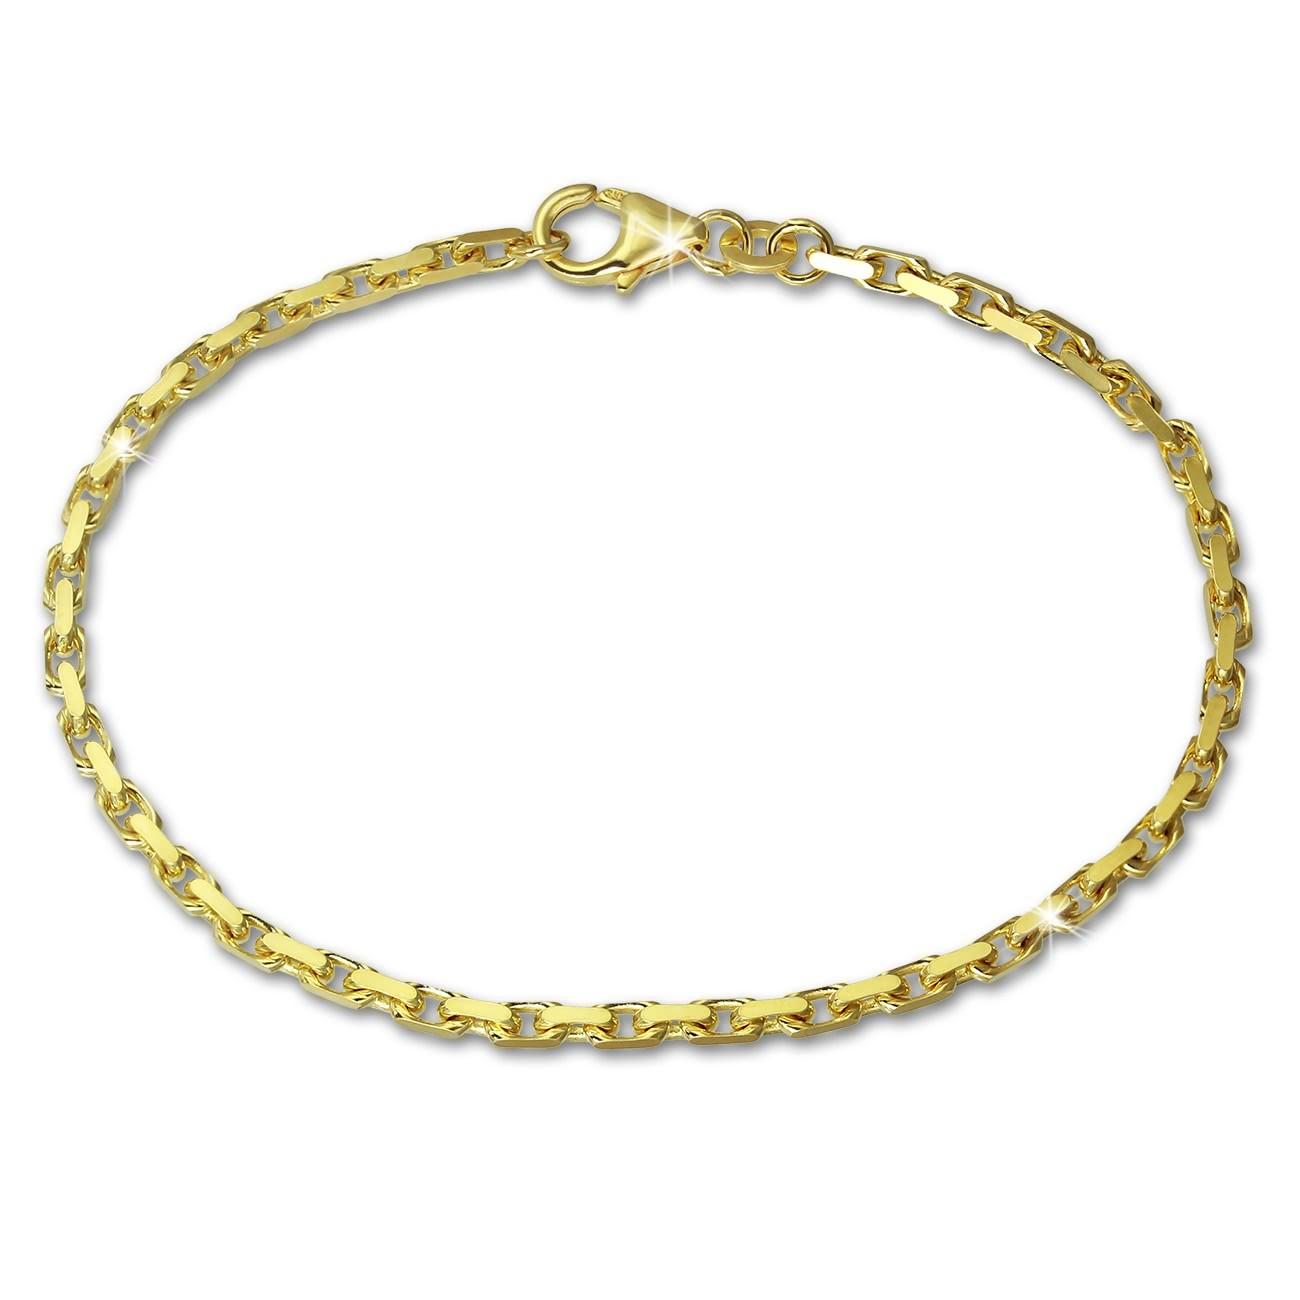 SilberDream Armband Anker diamantiert 333 Gold 18,5cm 8 Karat GDA0228Y